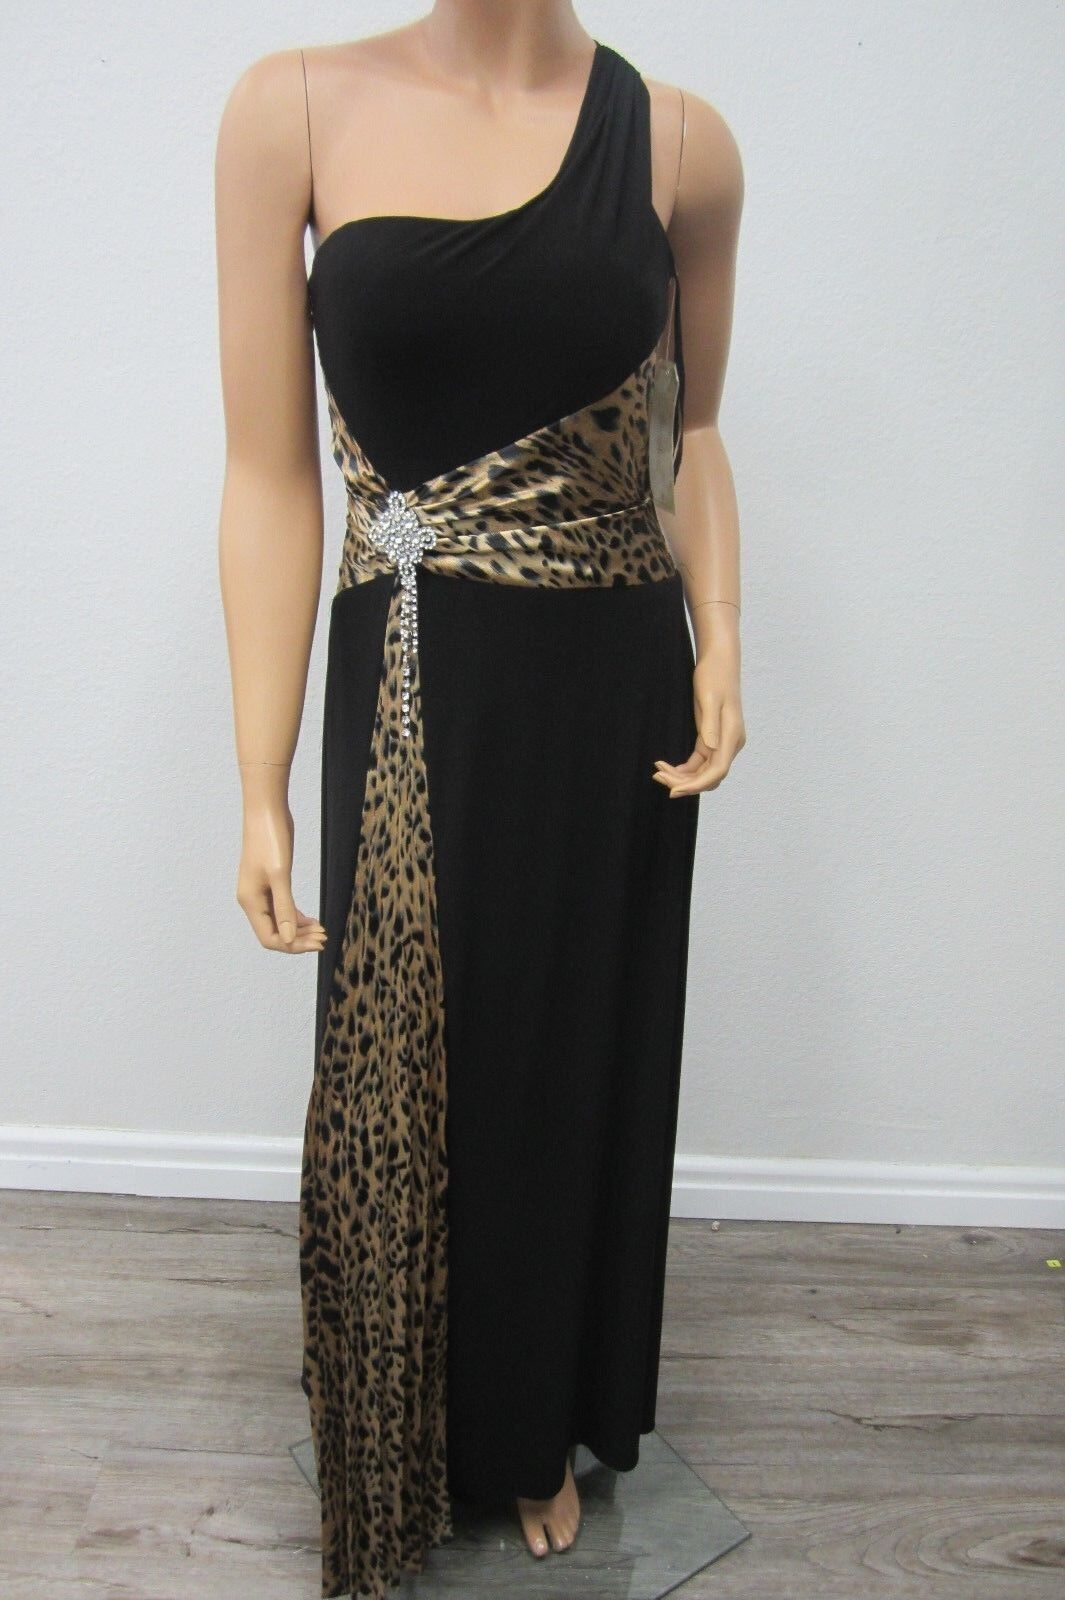 NWT EUREKA  Embellished Embellished Embellished Rhinestone One Strap Shoulder Dress Blk PrintGown Size S 32ef5d